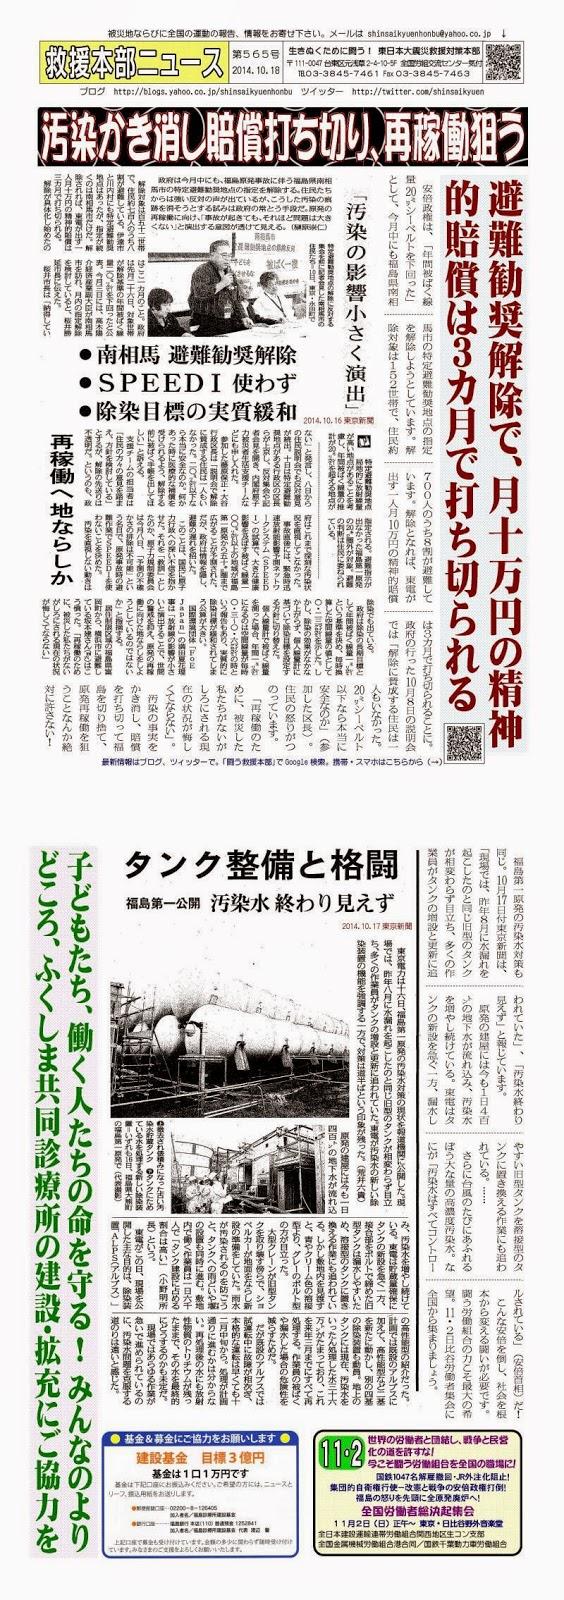 http://www.geocities.jp/shinsaikyuenhonbu/honbu565.pdf